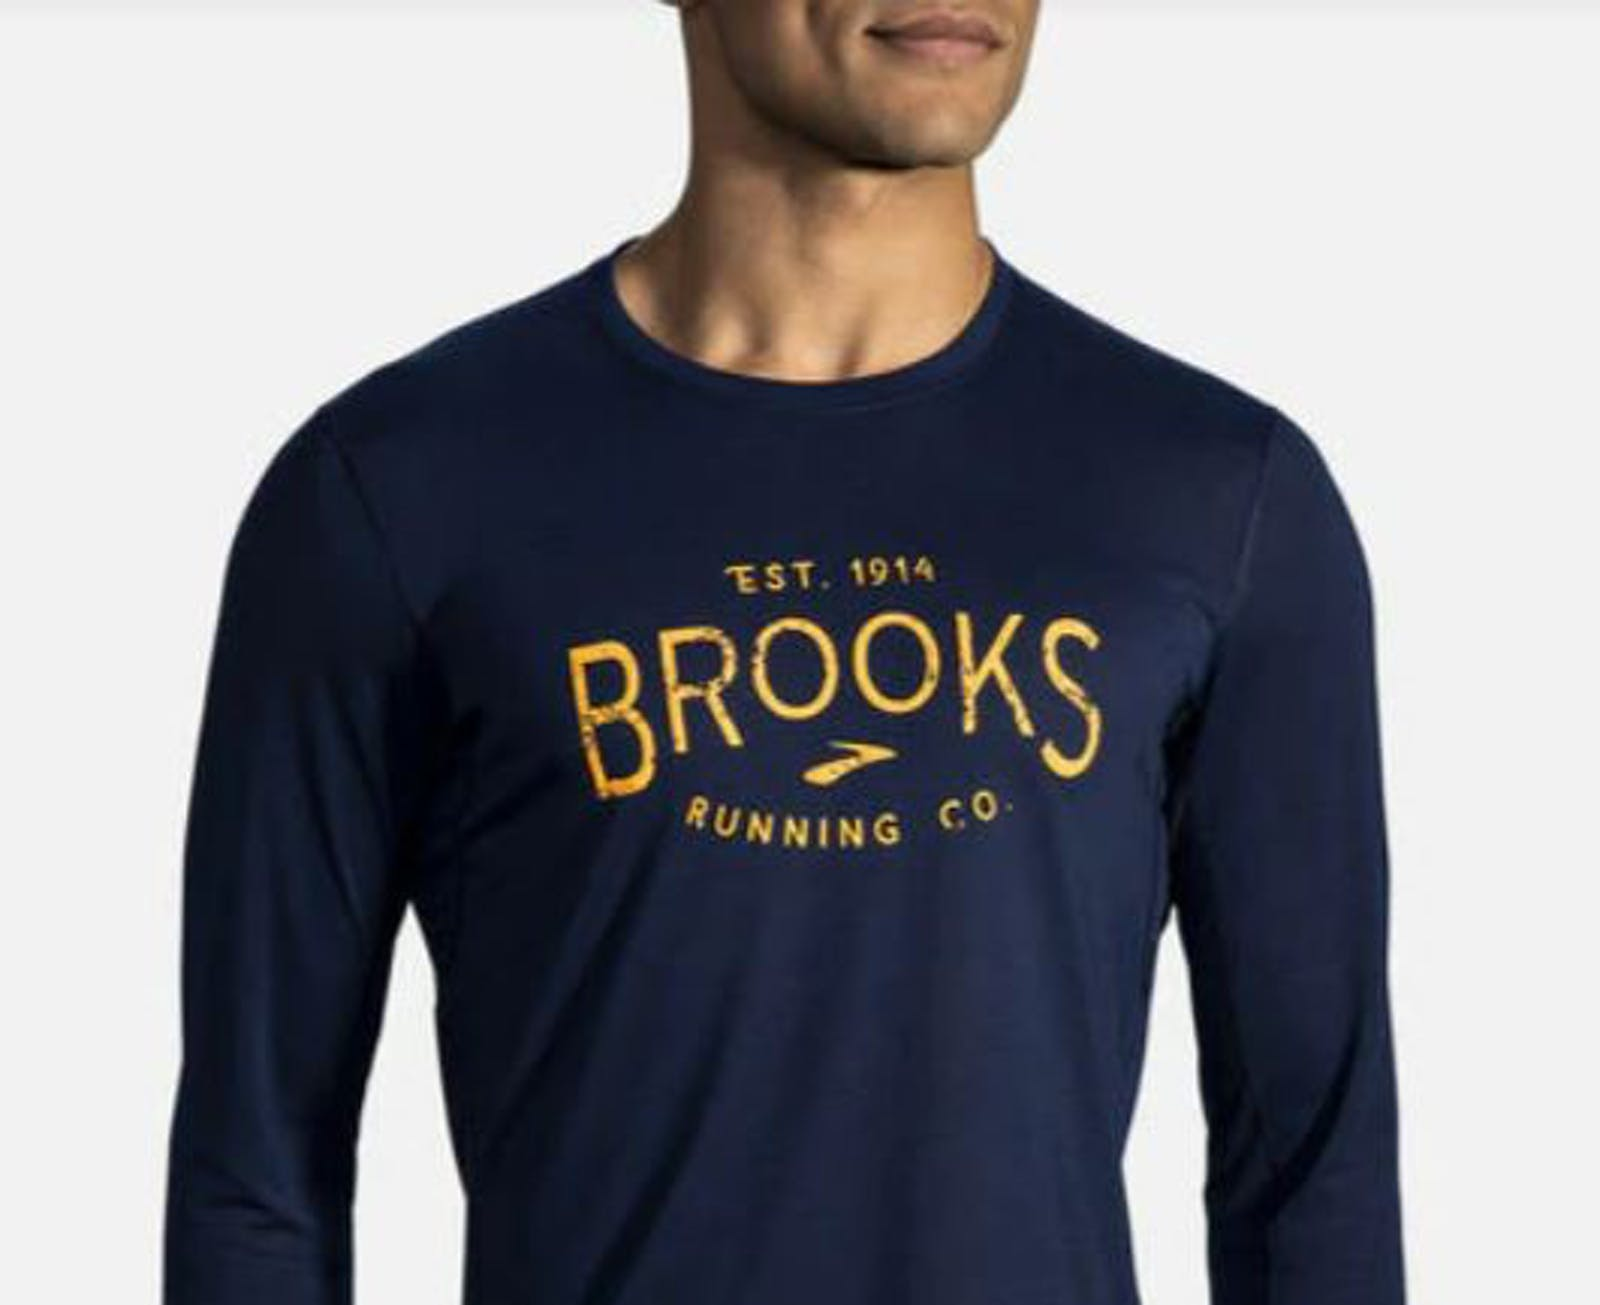 Man in long-sleeved Brooks shirt